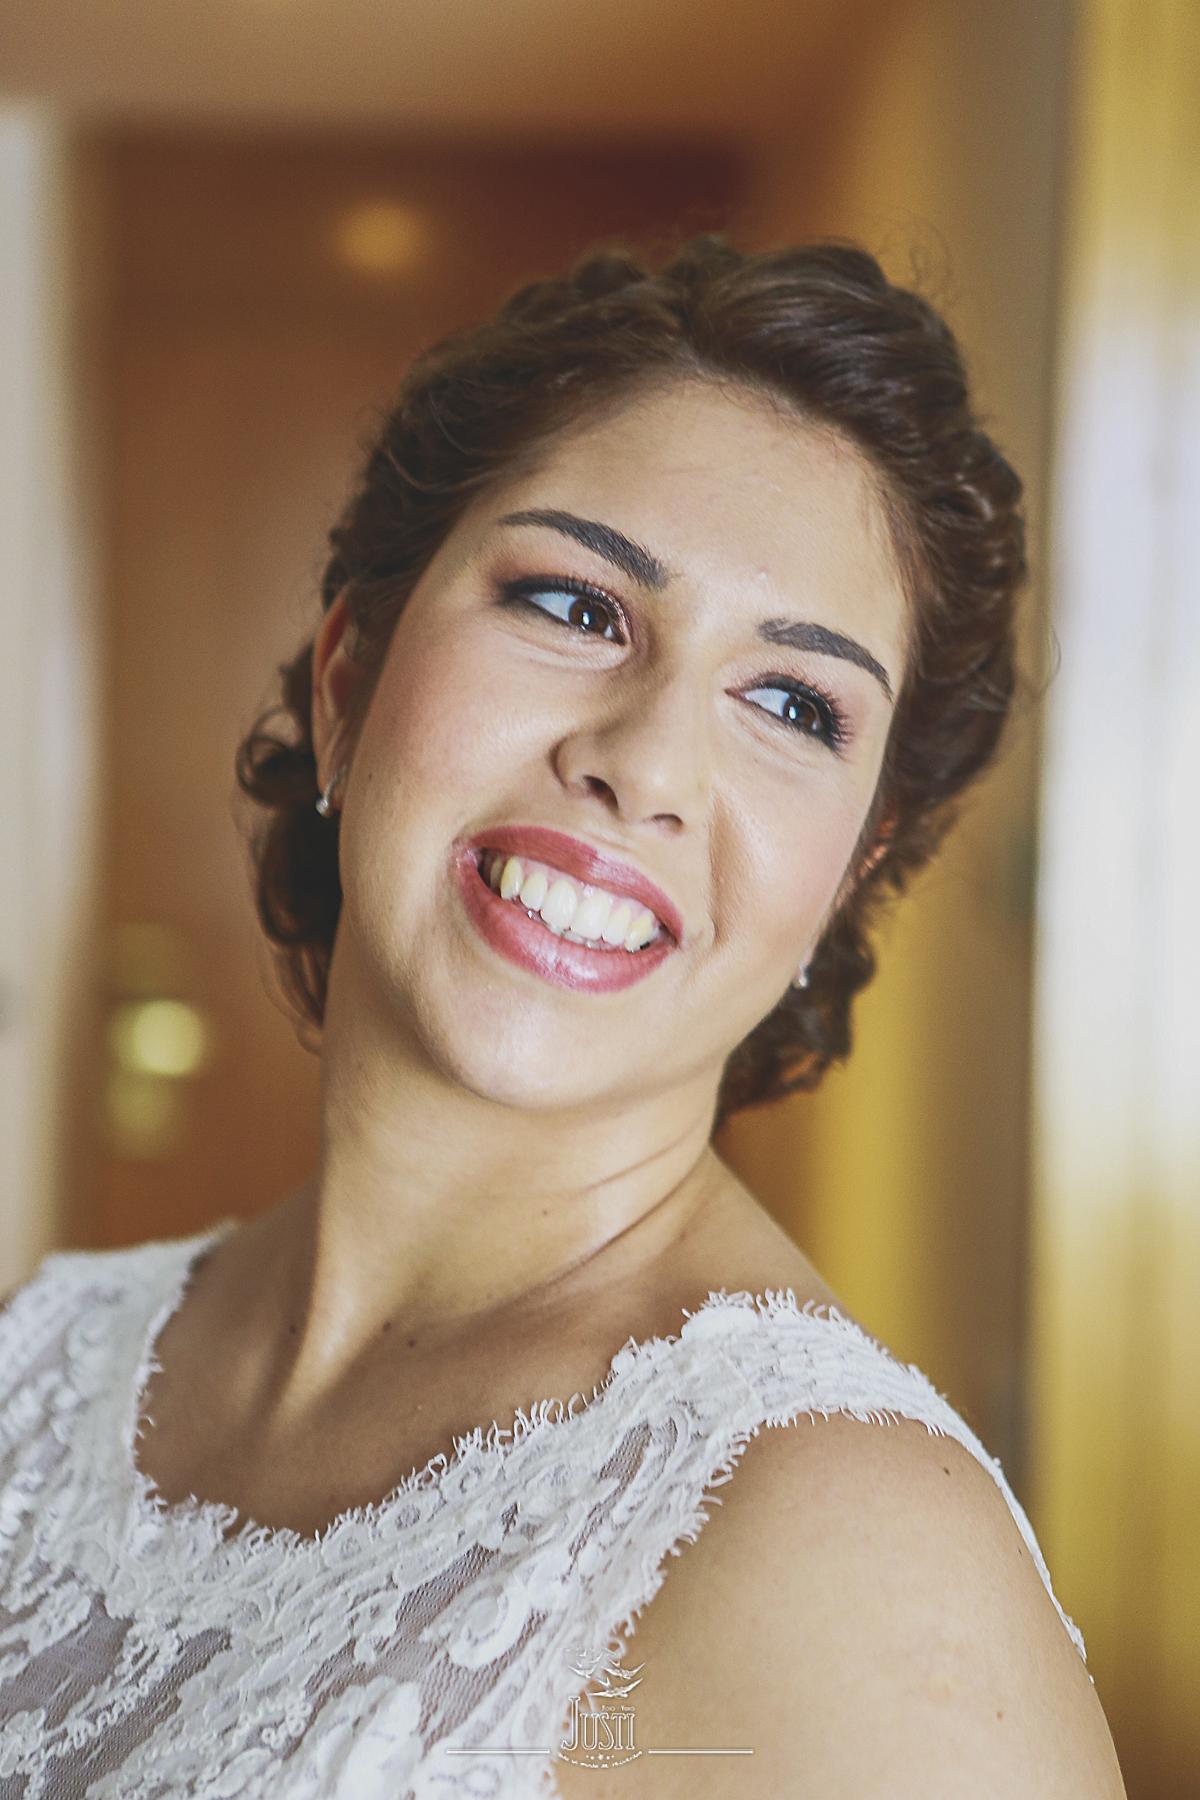 Foto video justi Boda en ermita las cruces don benito y hotel vegas altas fotografia profesional bodas